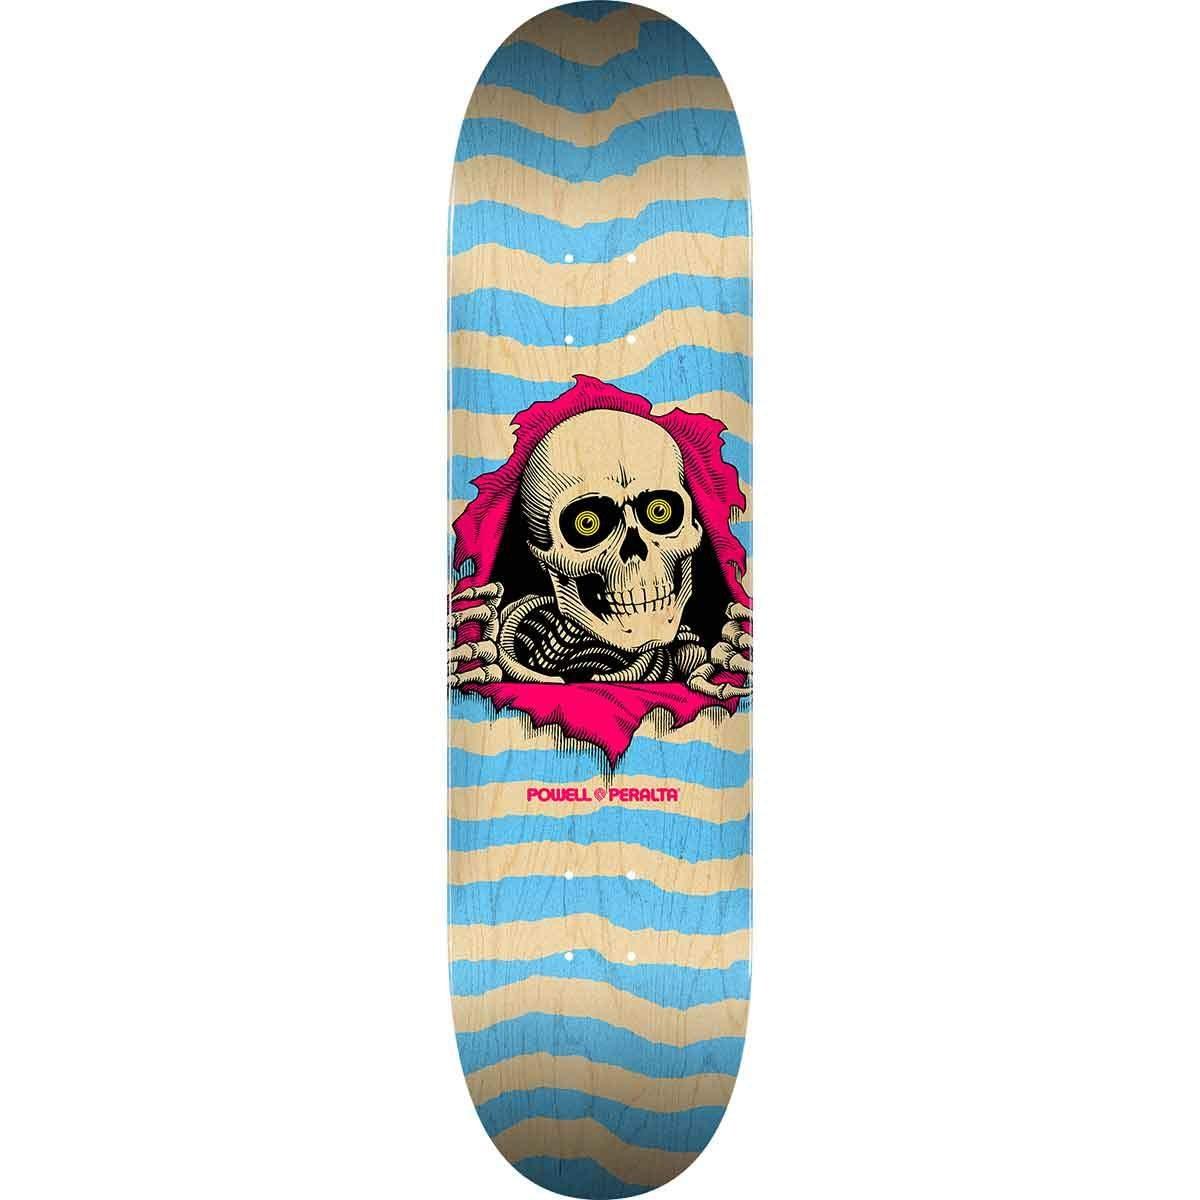 Powell Peralta Ripper Natural Blue 248 K20 8.25 x 31.95 Skateboard Deck